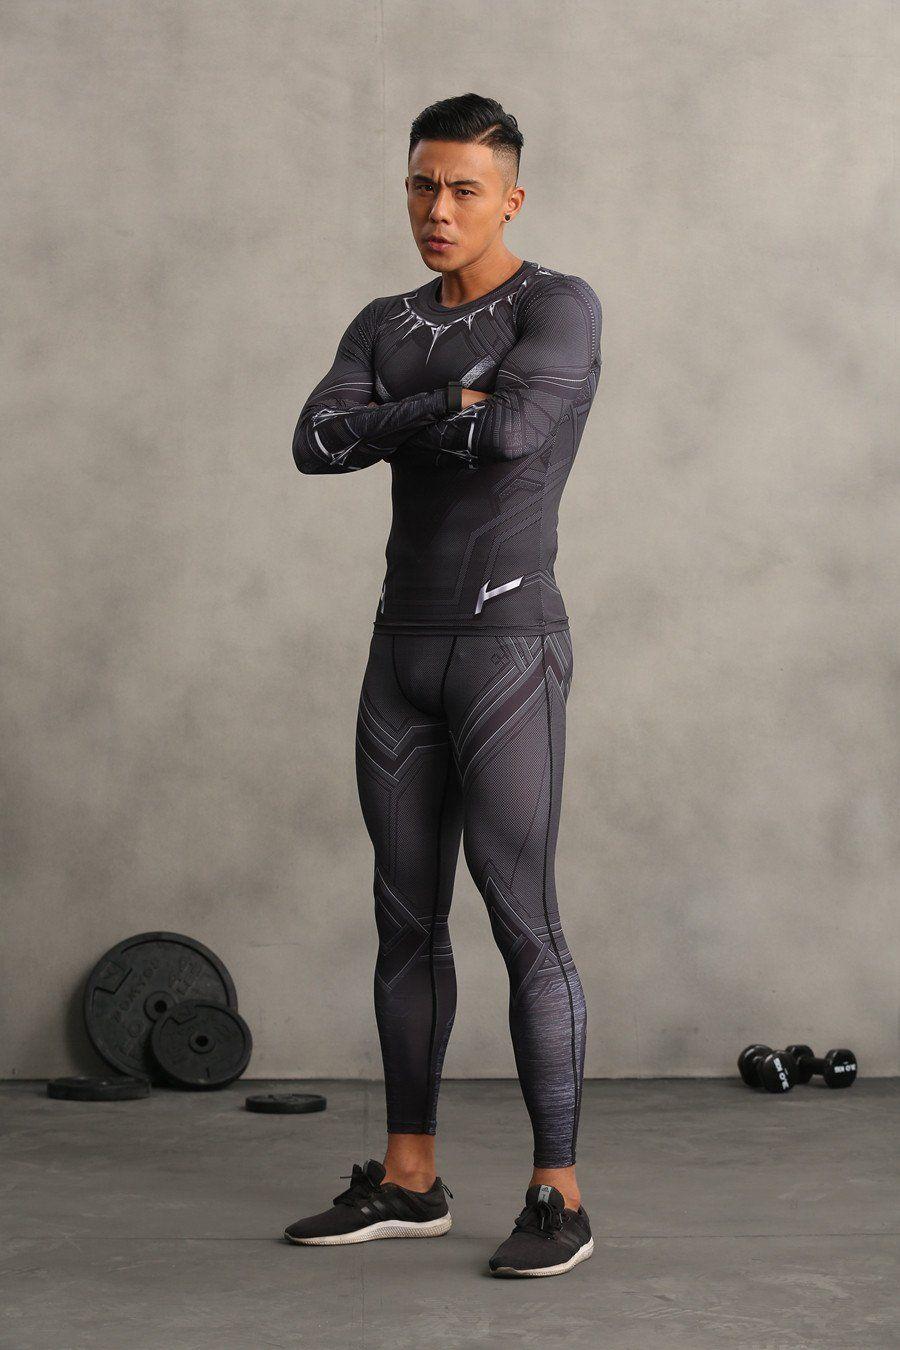 69f98ba8fee0d4 Black Panther Marvel Theme Design Men Cosplay Compression Leggings # blackpanther #leggings #gym